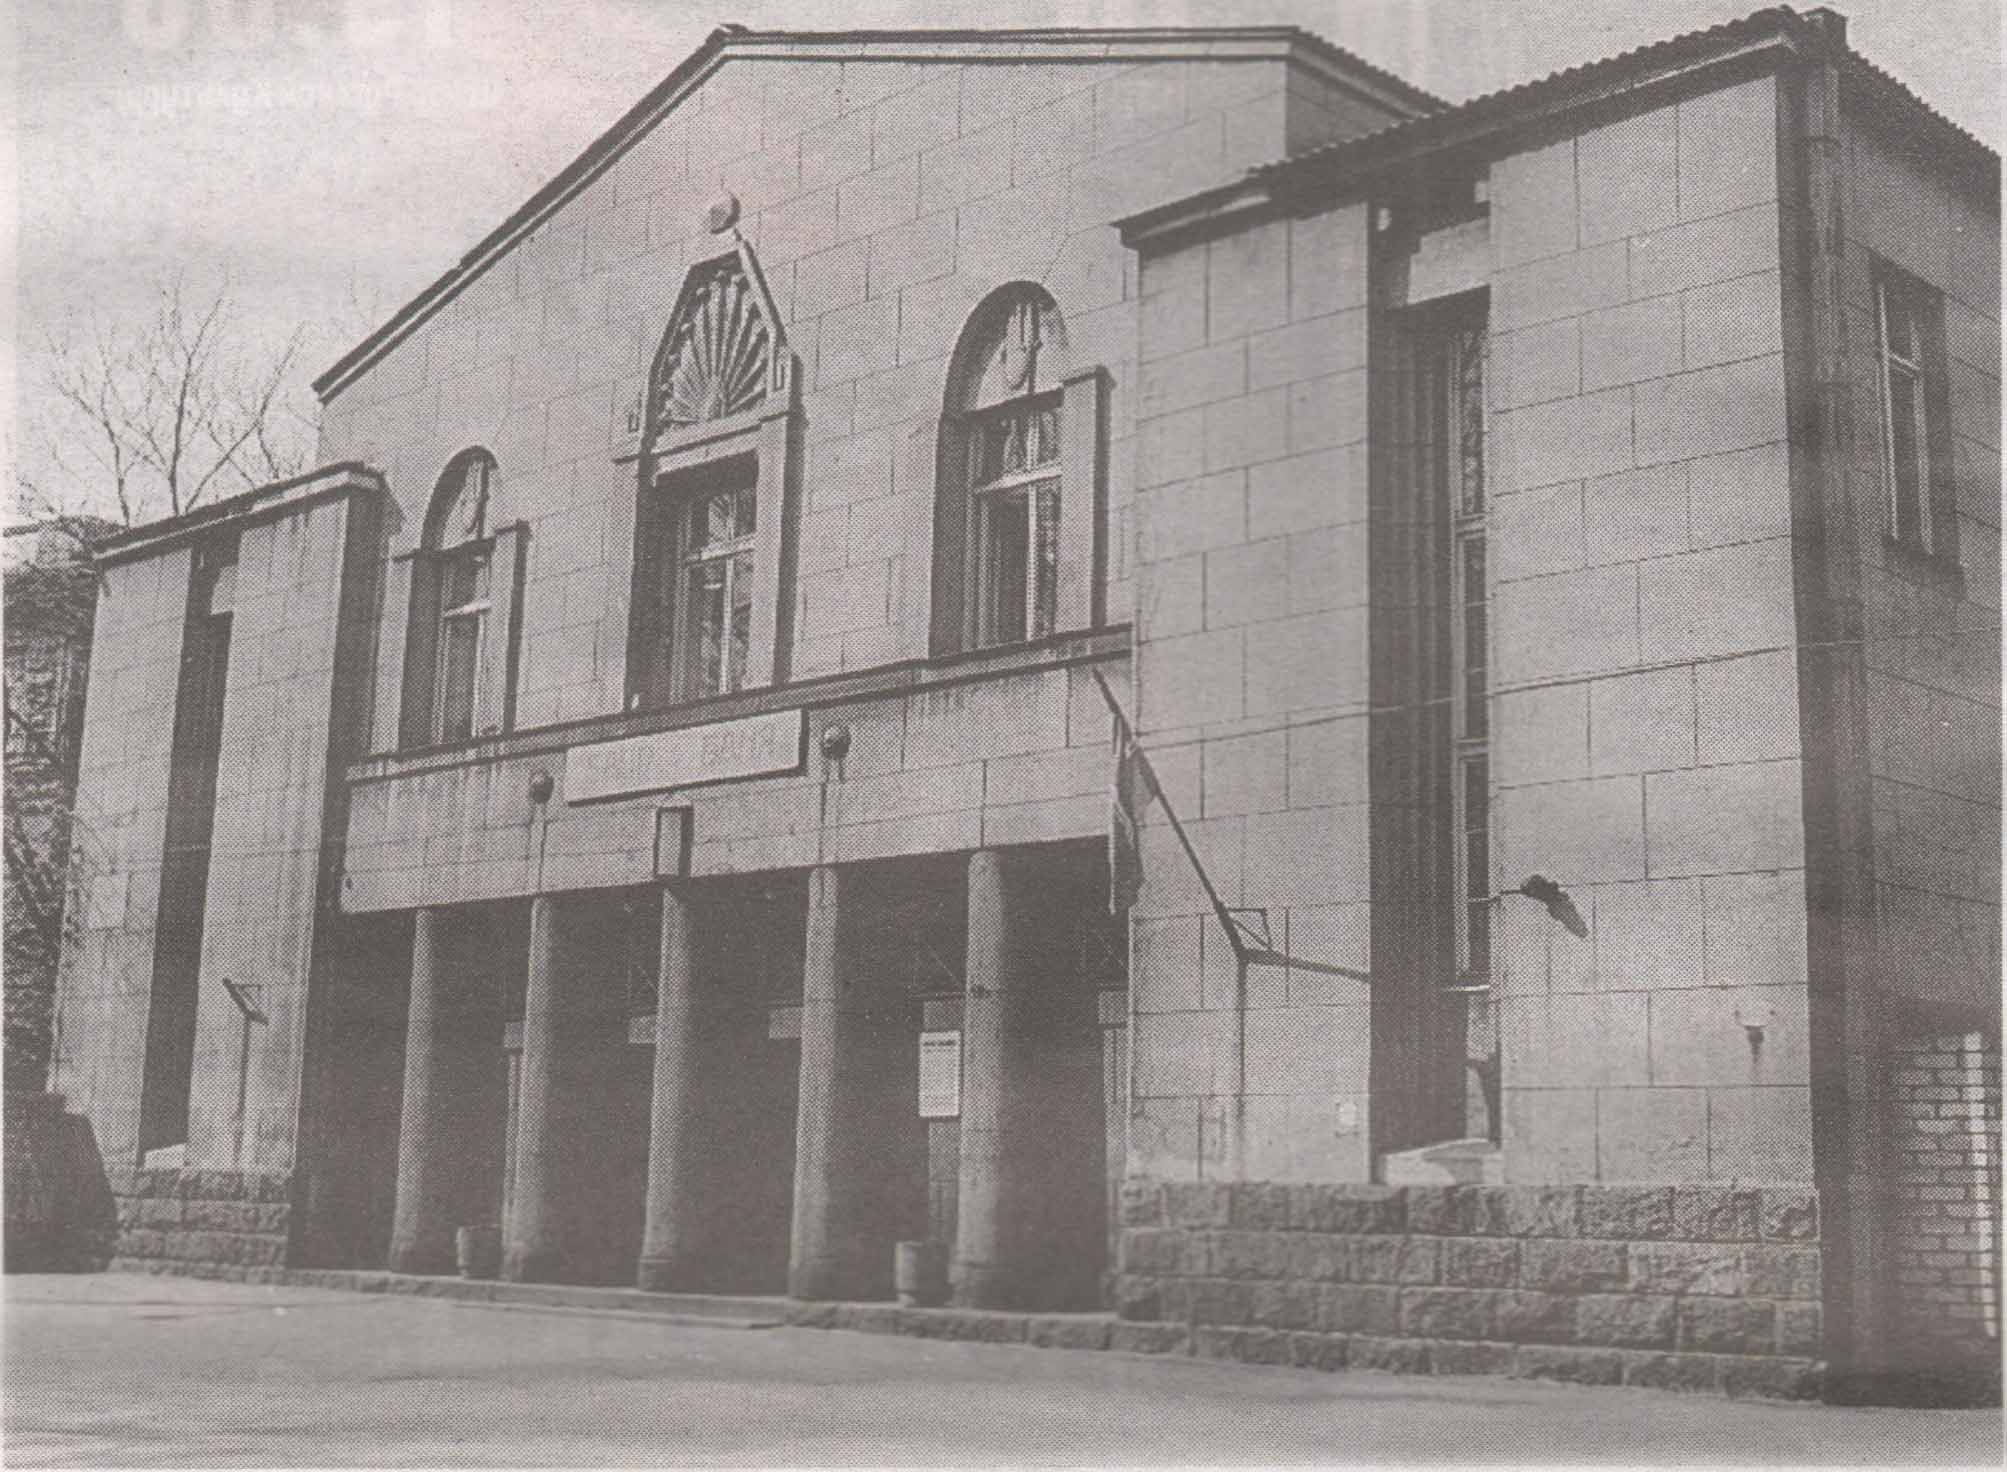 Главный фасад здания бани на улице Вана-Каламая, 9а полвека тому назад.